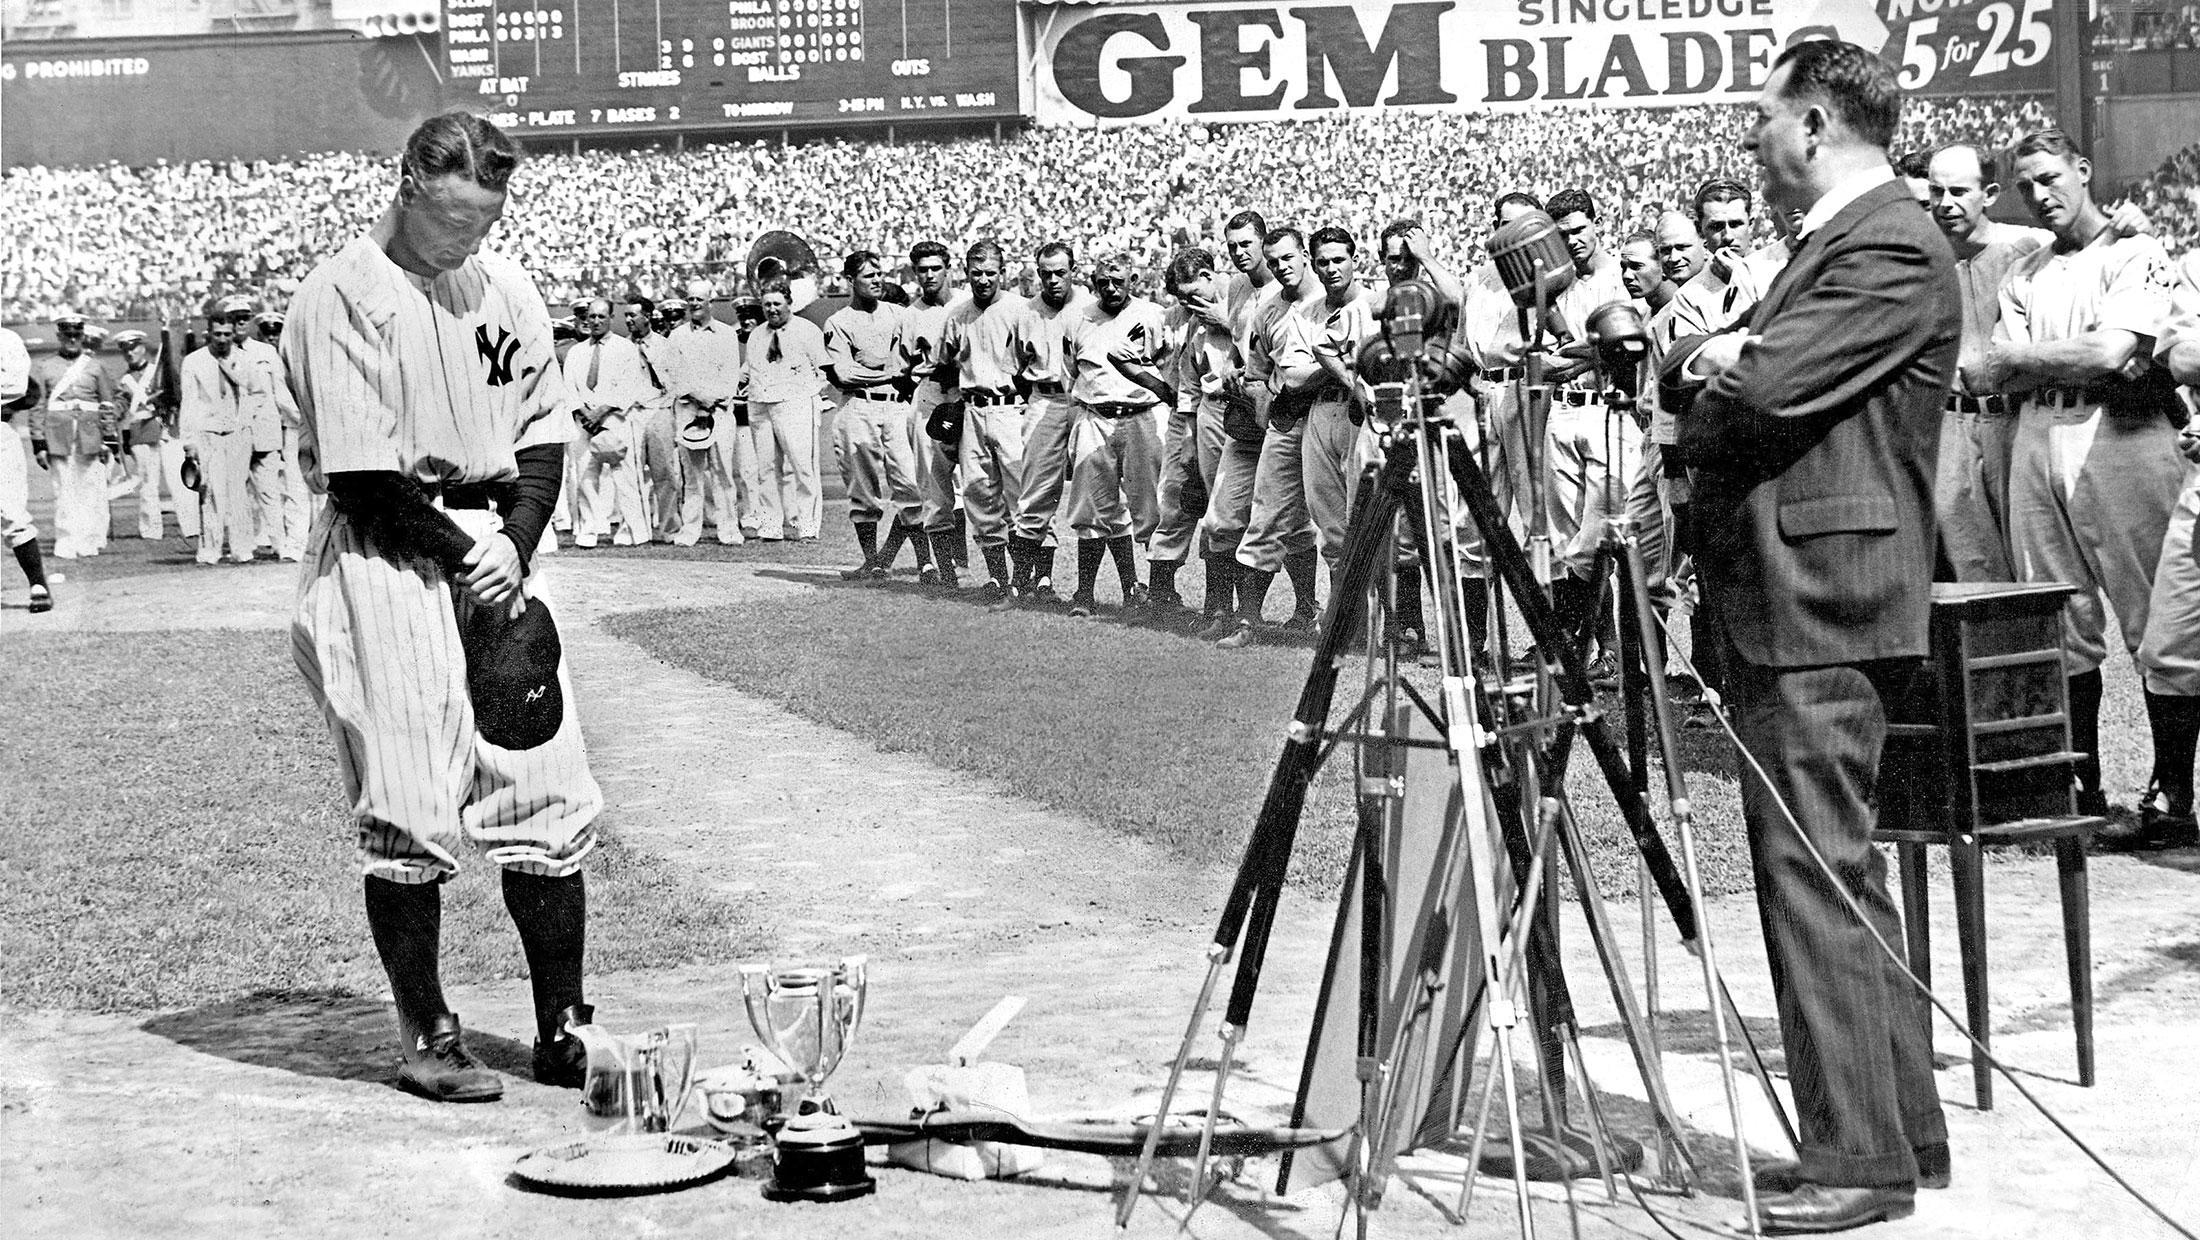 It's Official! All 30 Major League Baseball Teams Endorse League-Wide Lou  Gehrig Day! | The ALS Association